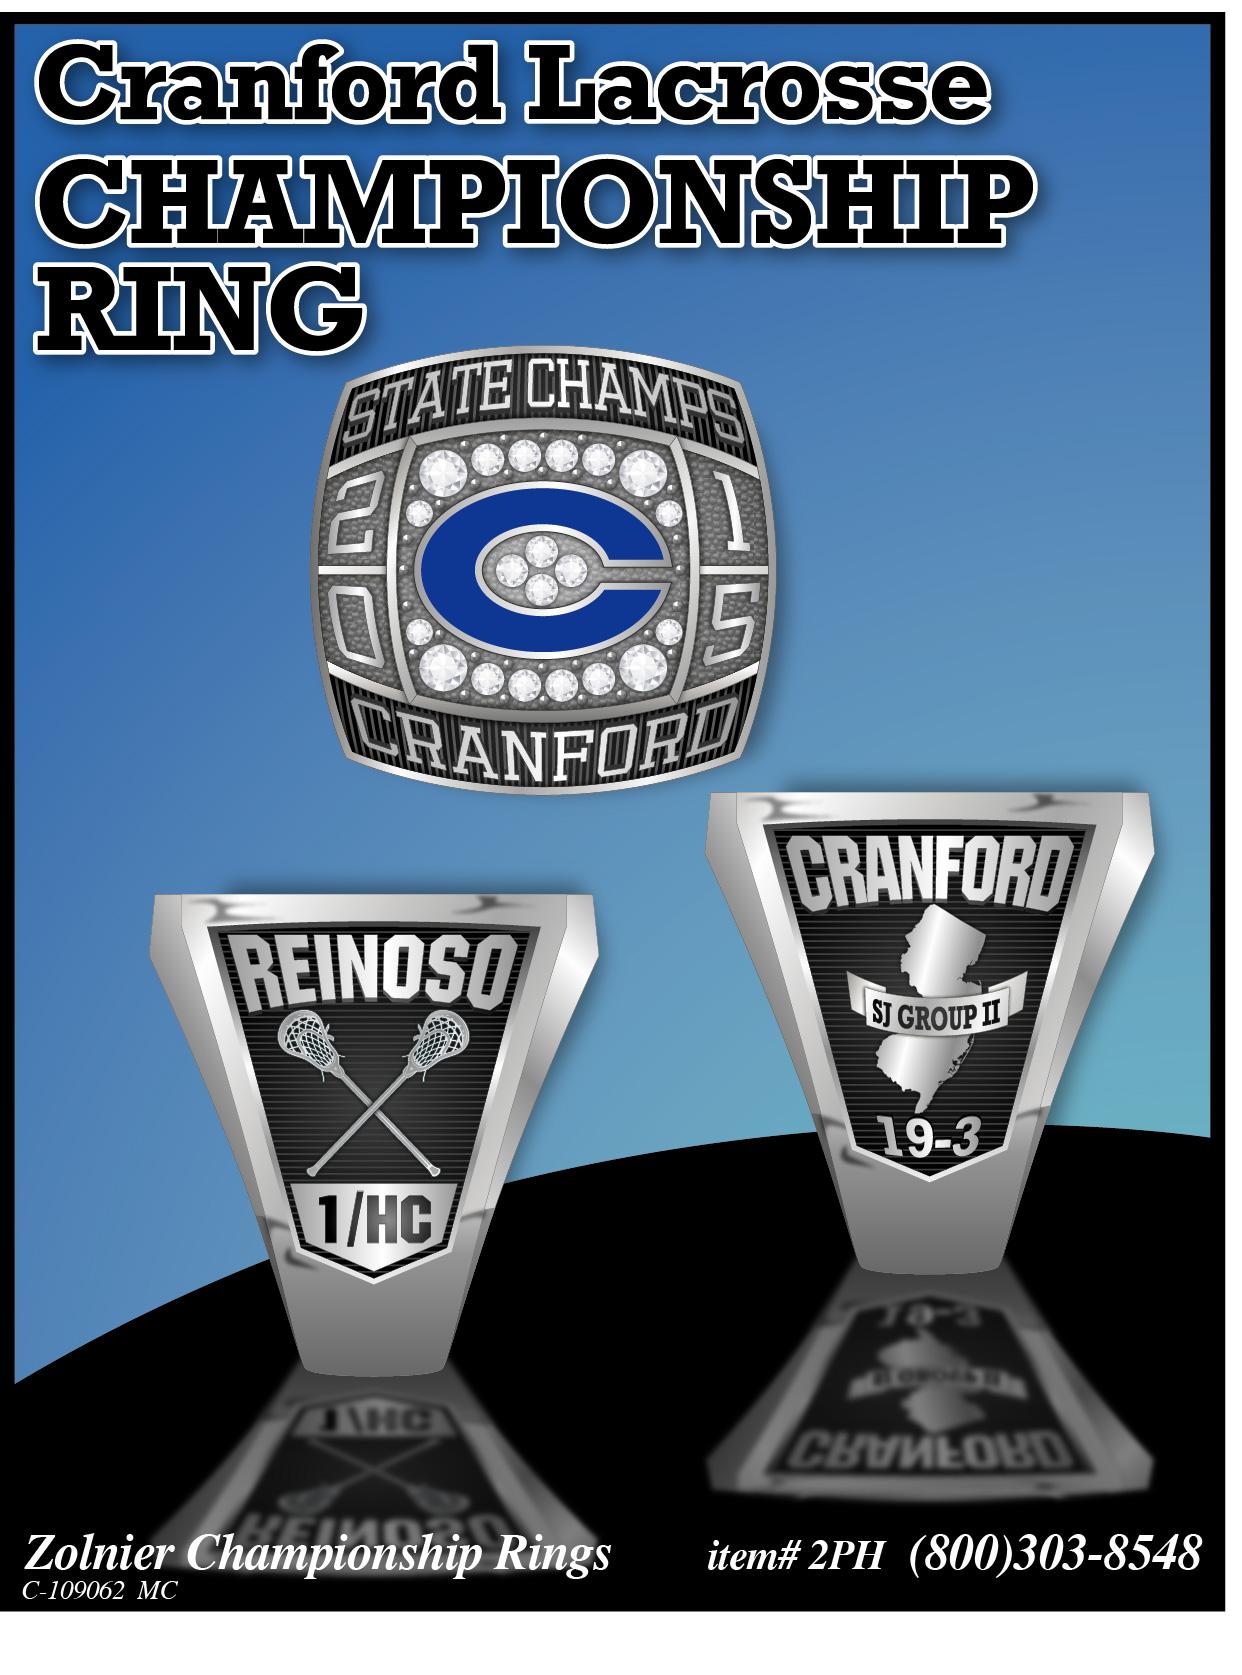 C-109062 ZOLNIER LLT Cranford Lacrosse 2 Championship Ring MC